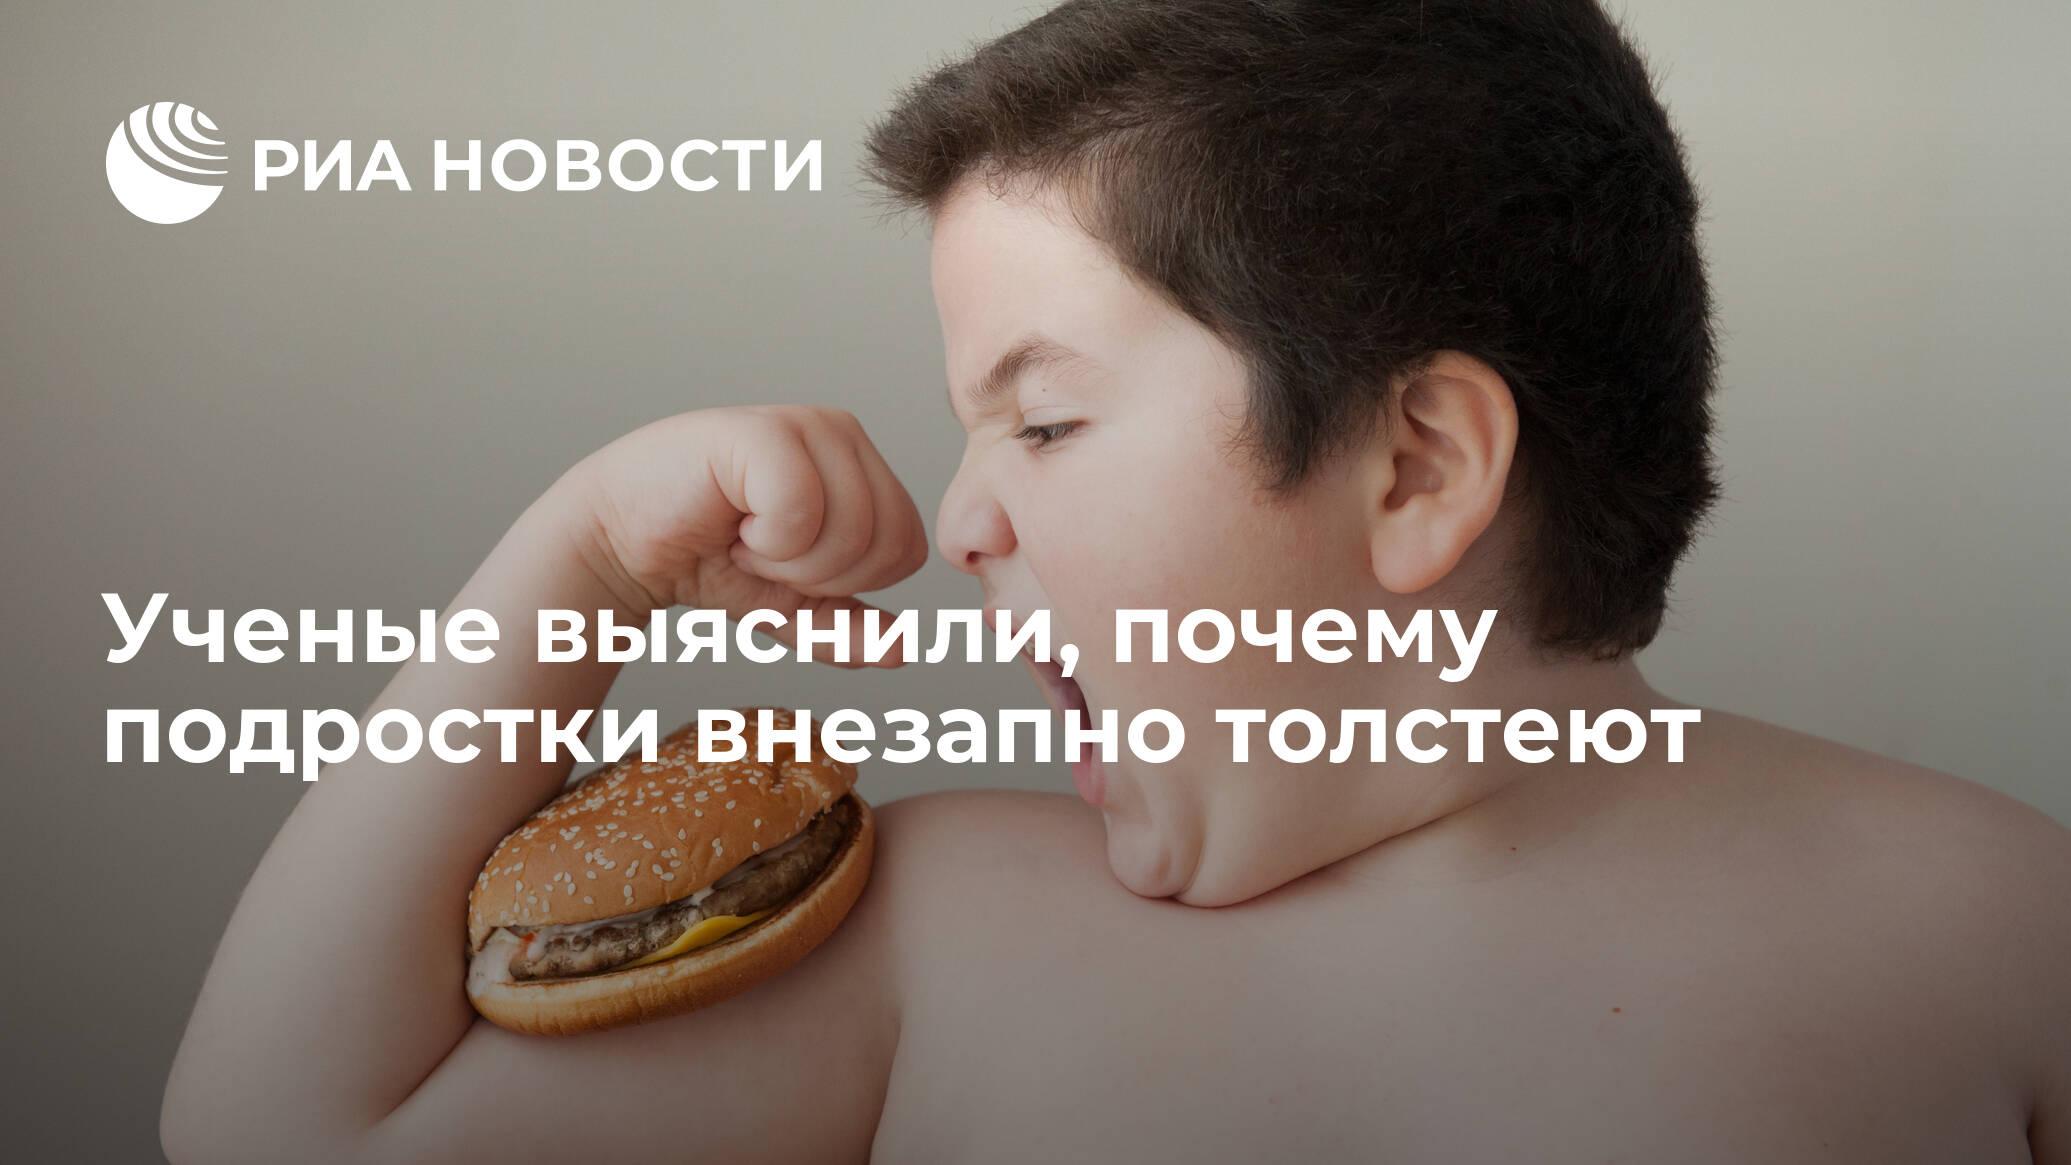 помогите снизить вес нло